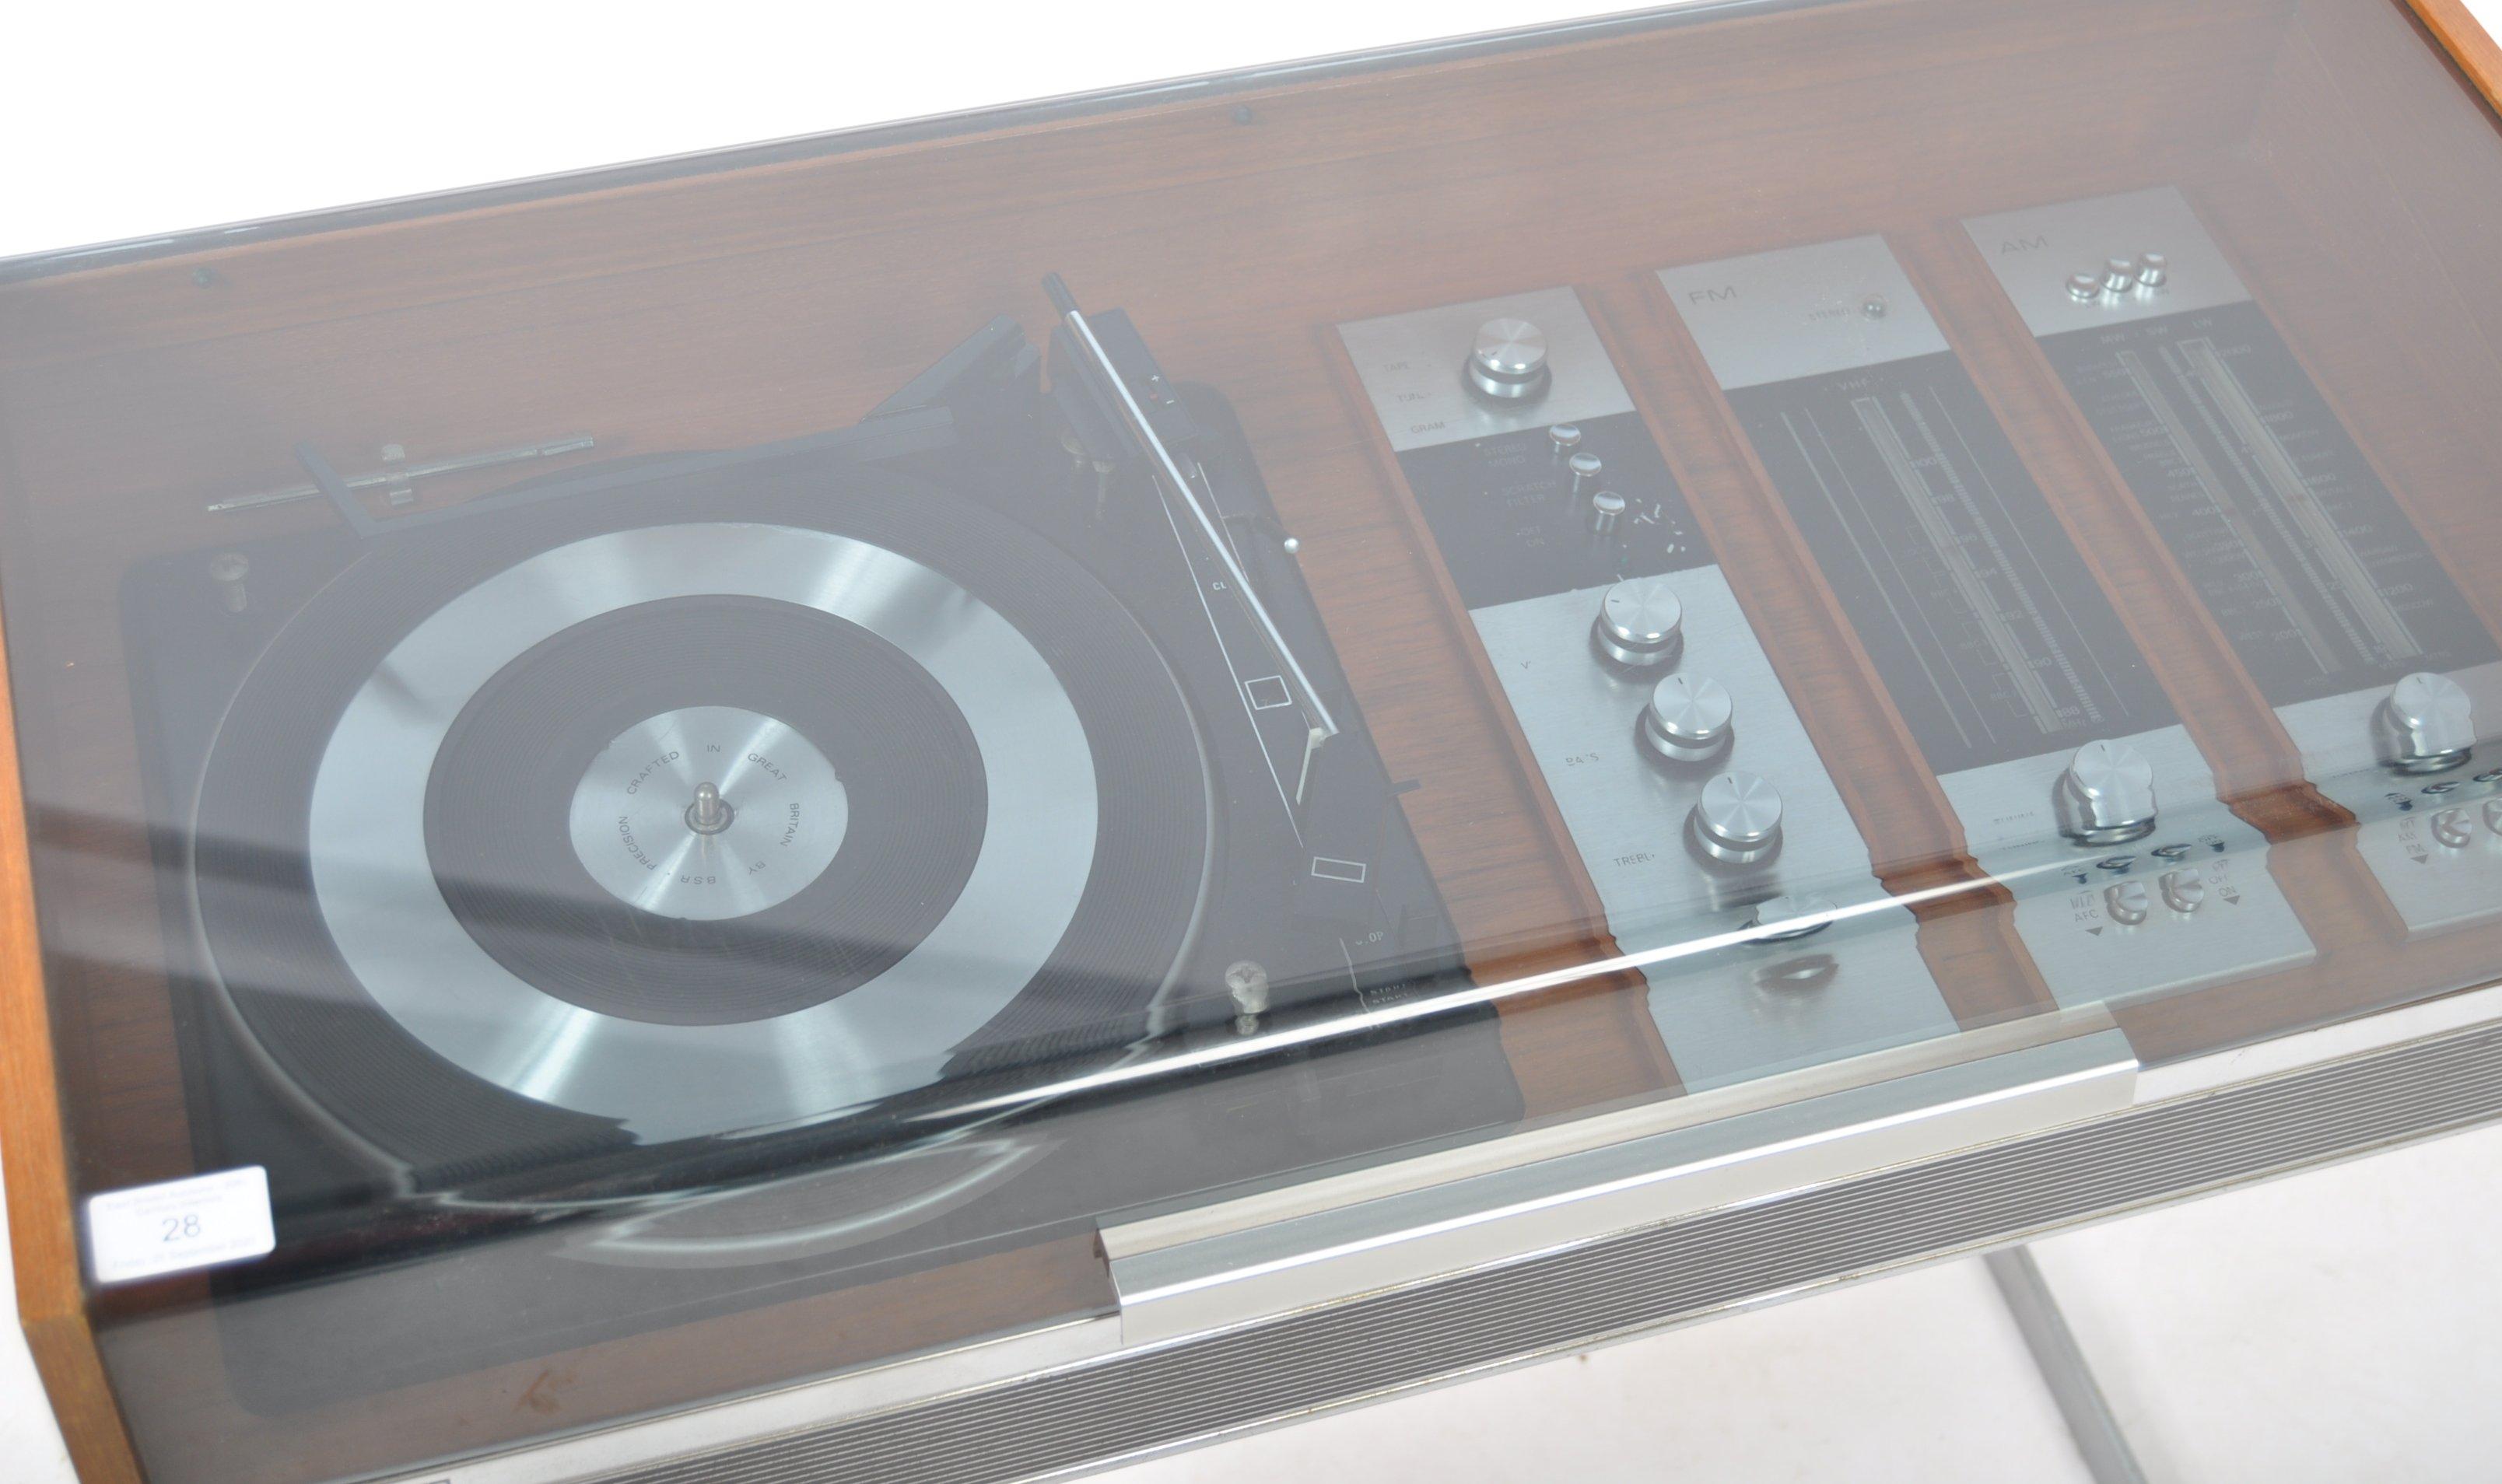 STUNNING DECCA SOUND TEAK CASED AUDIO SYSTEM RAISED ON CHROME SUPPORTS - Image 2 of 8